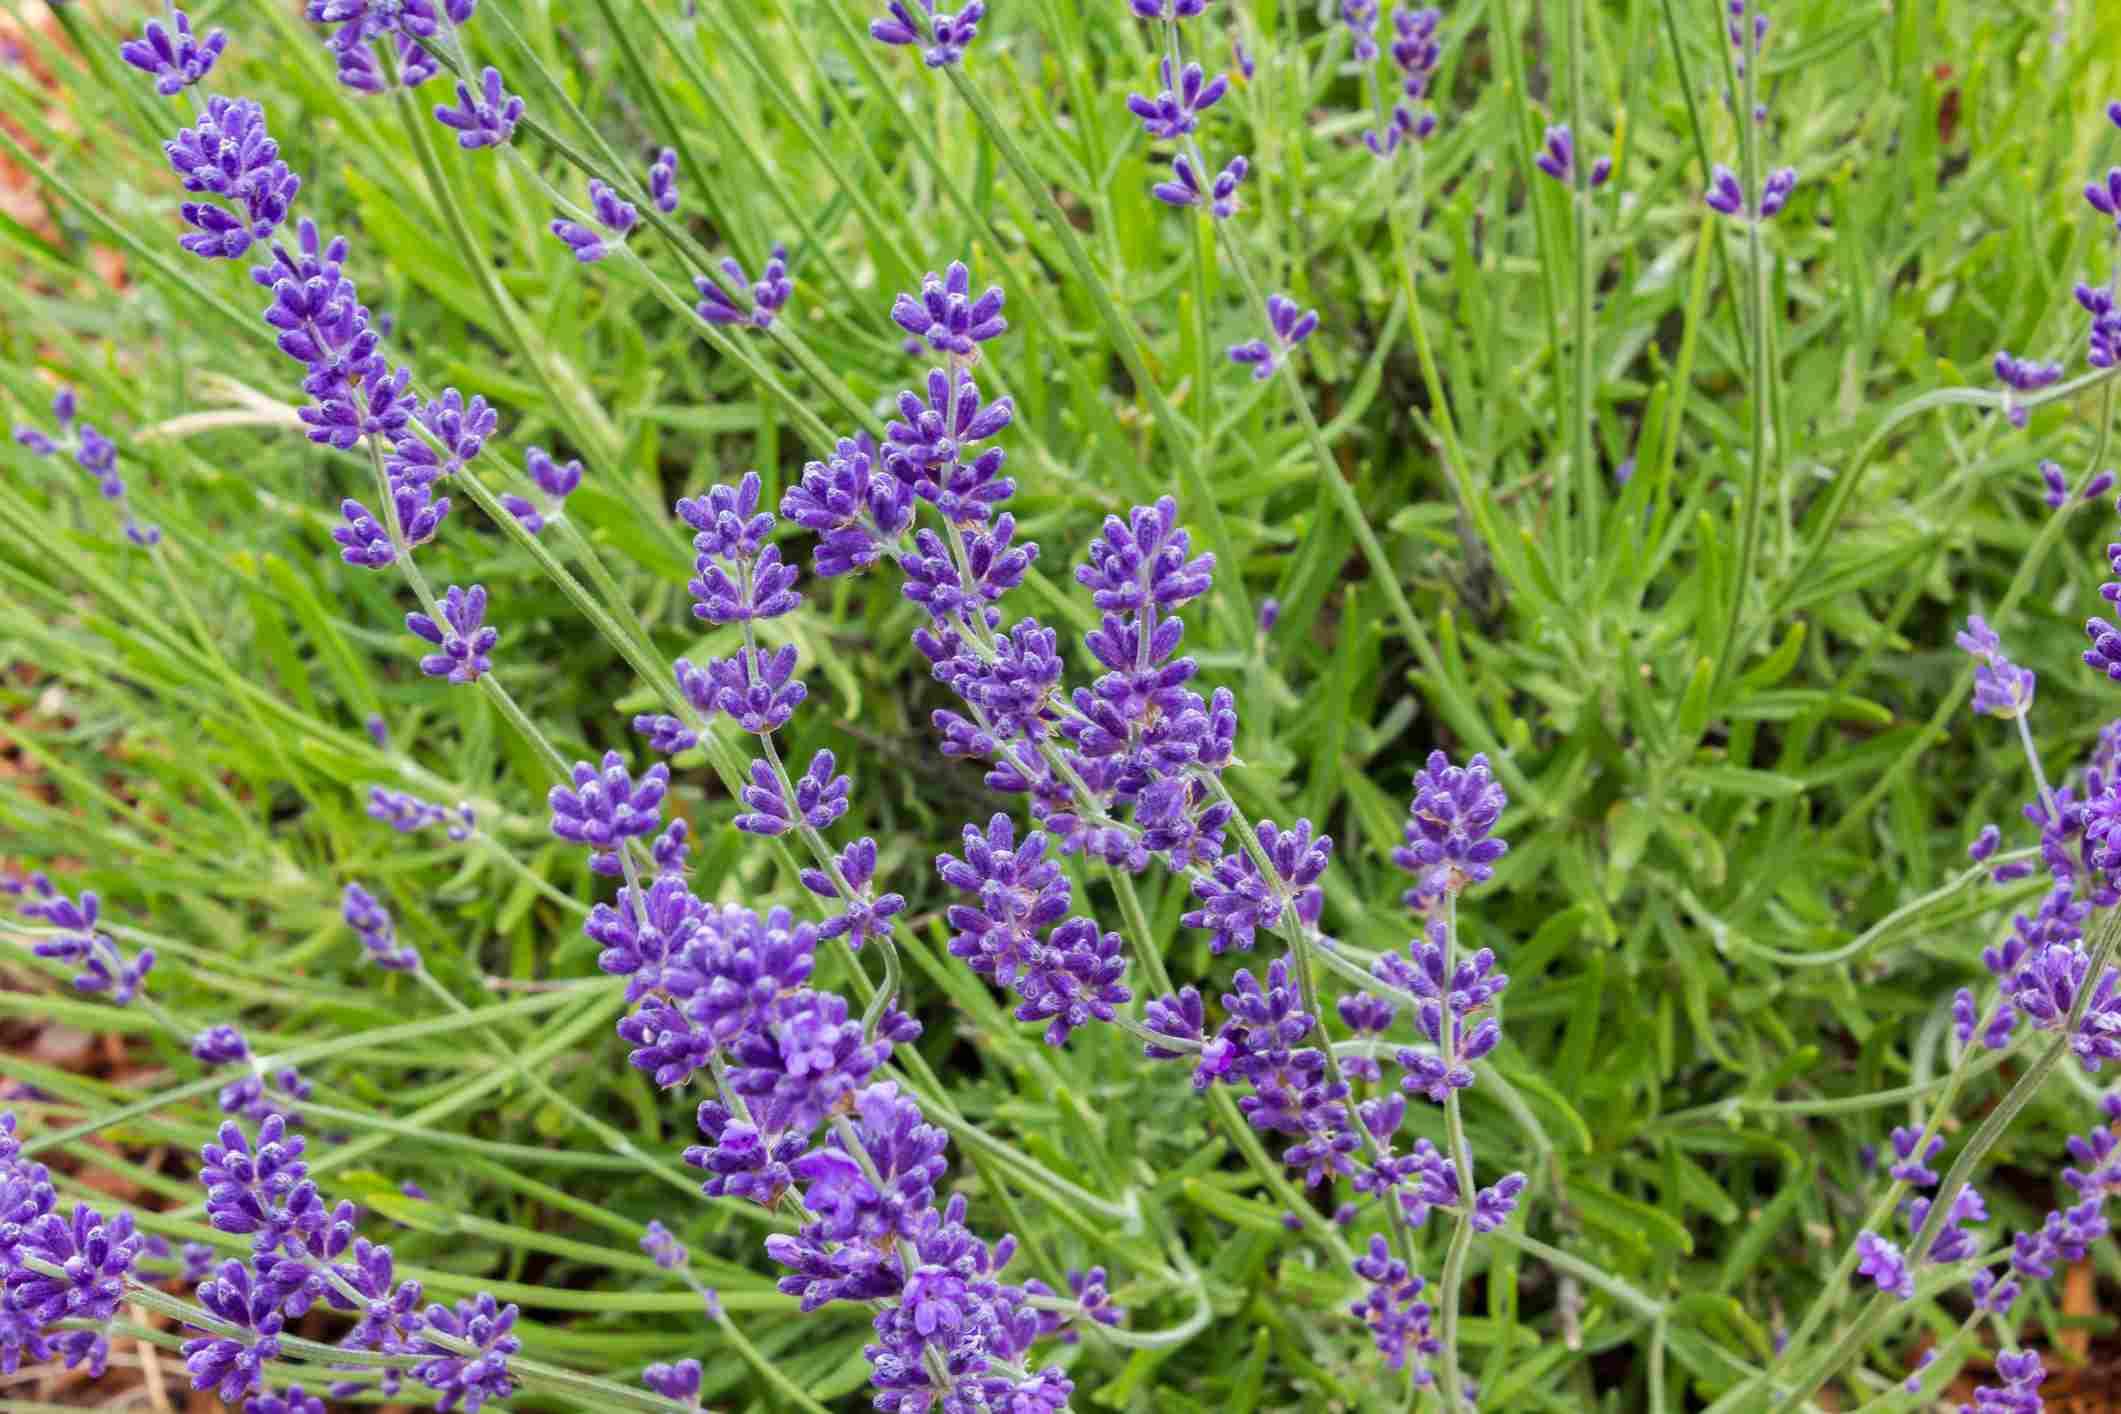 Lavender plants in bloom.